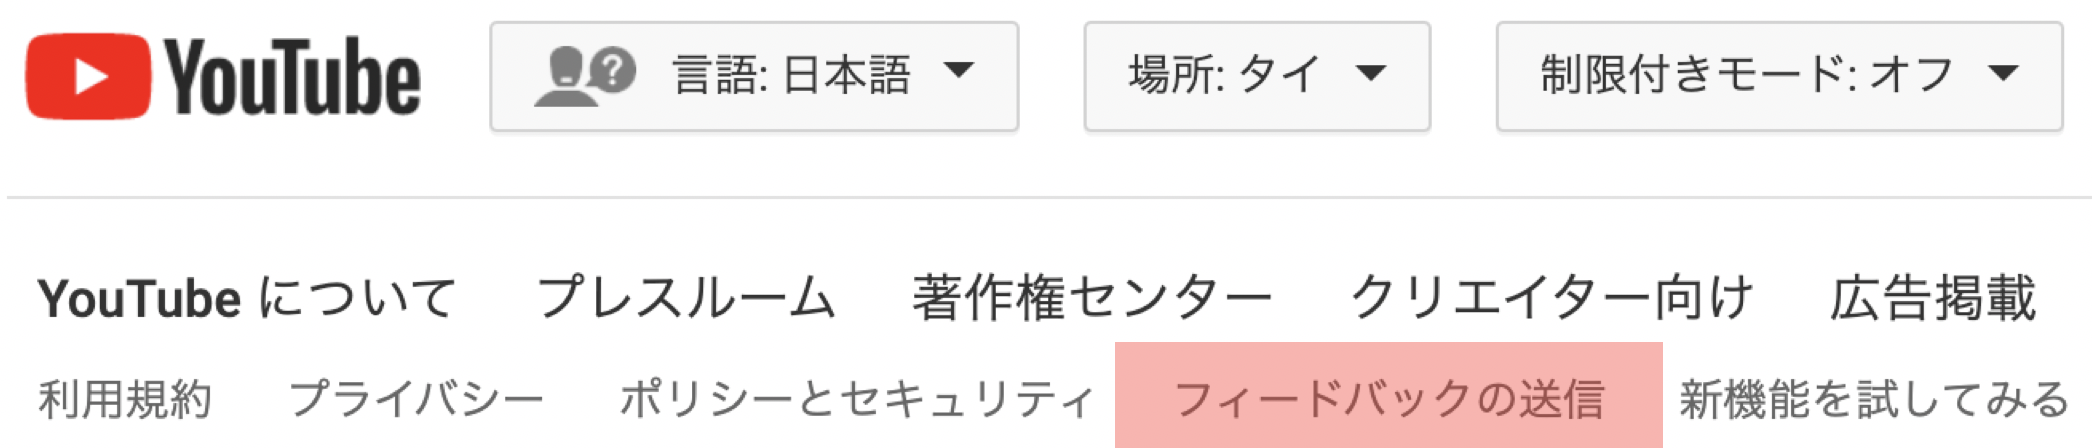 YouTubeチャンネル 停止 誤BAN 傾向 対策